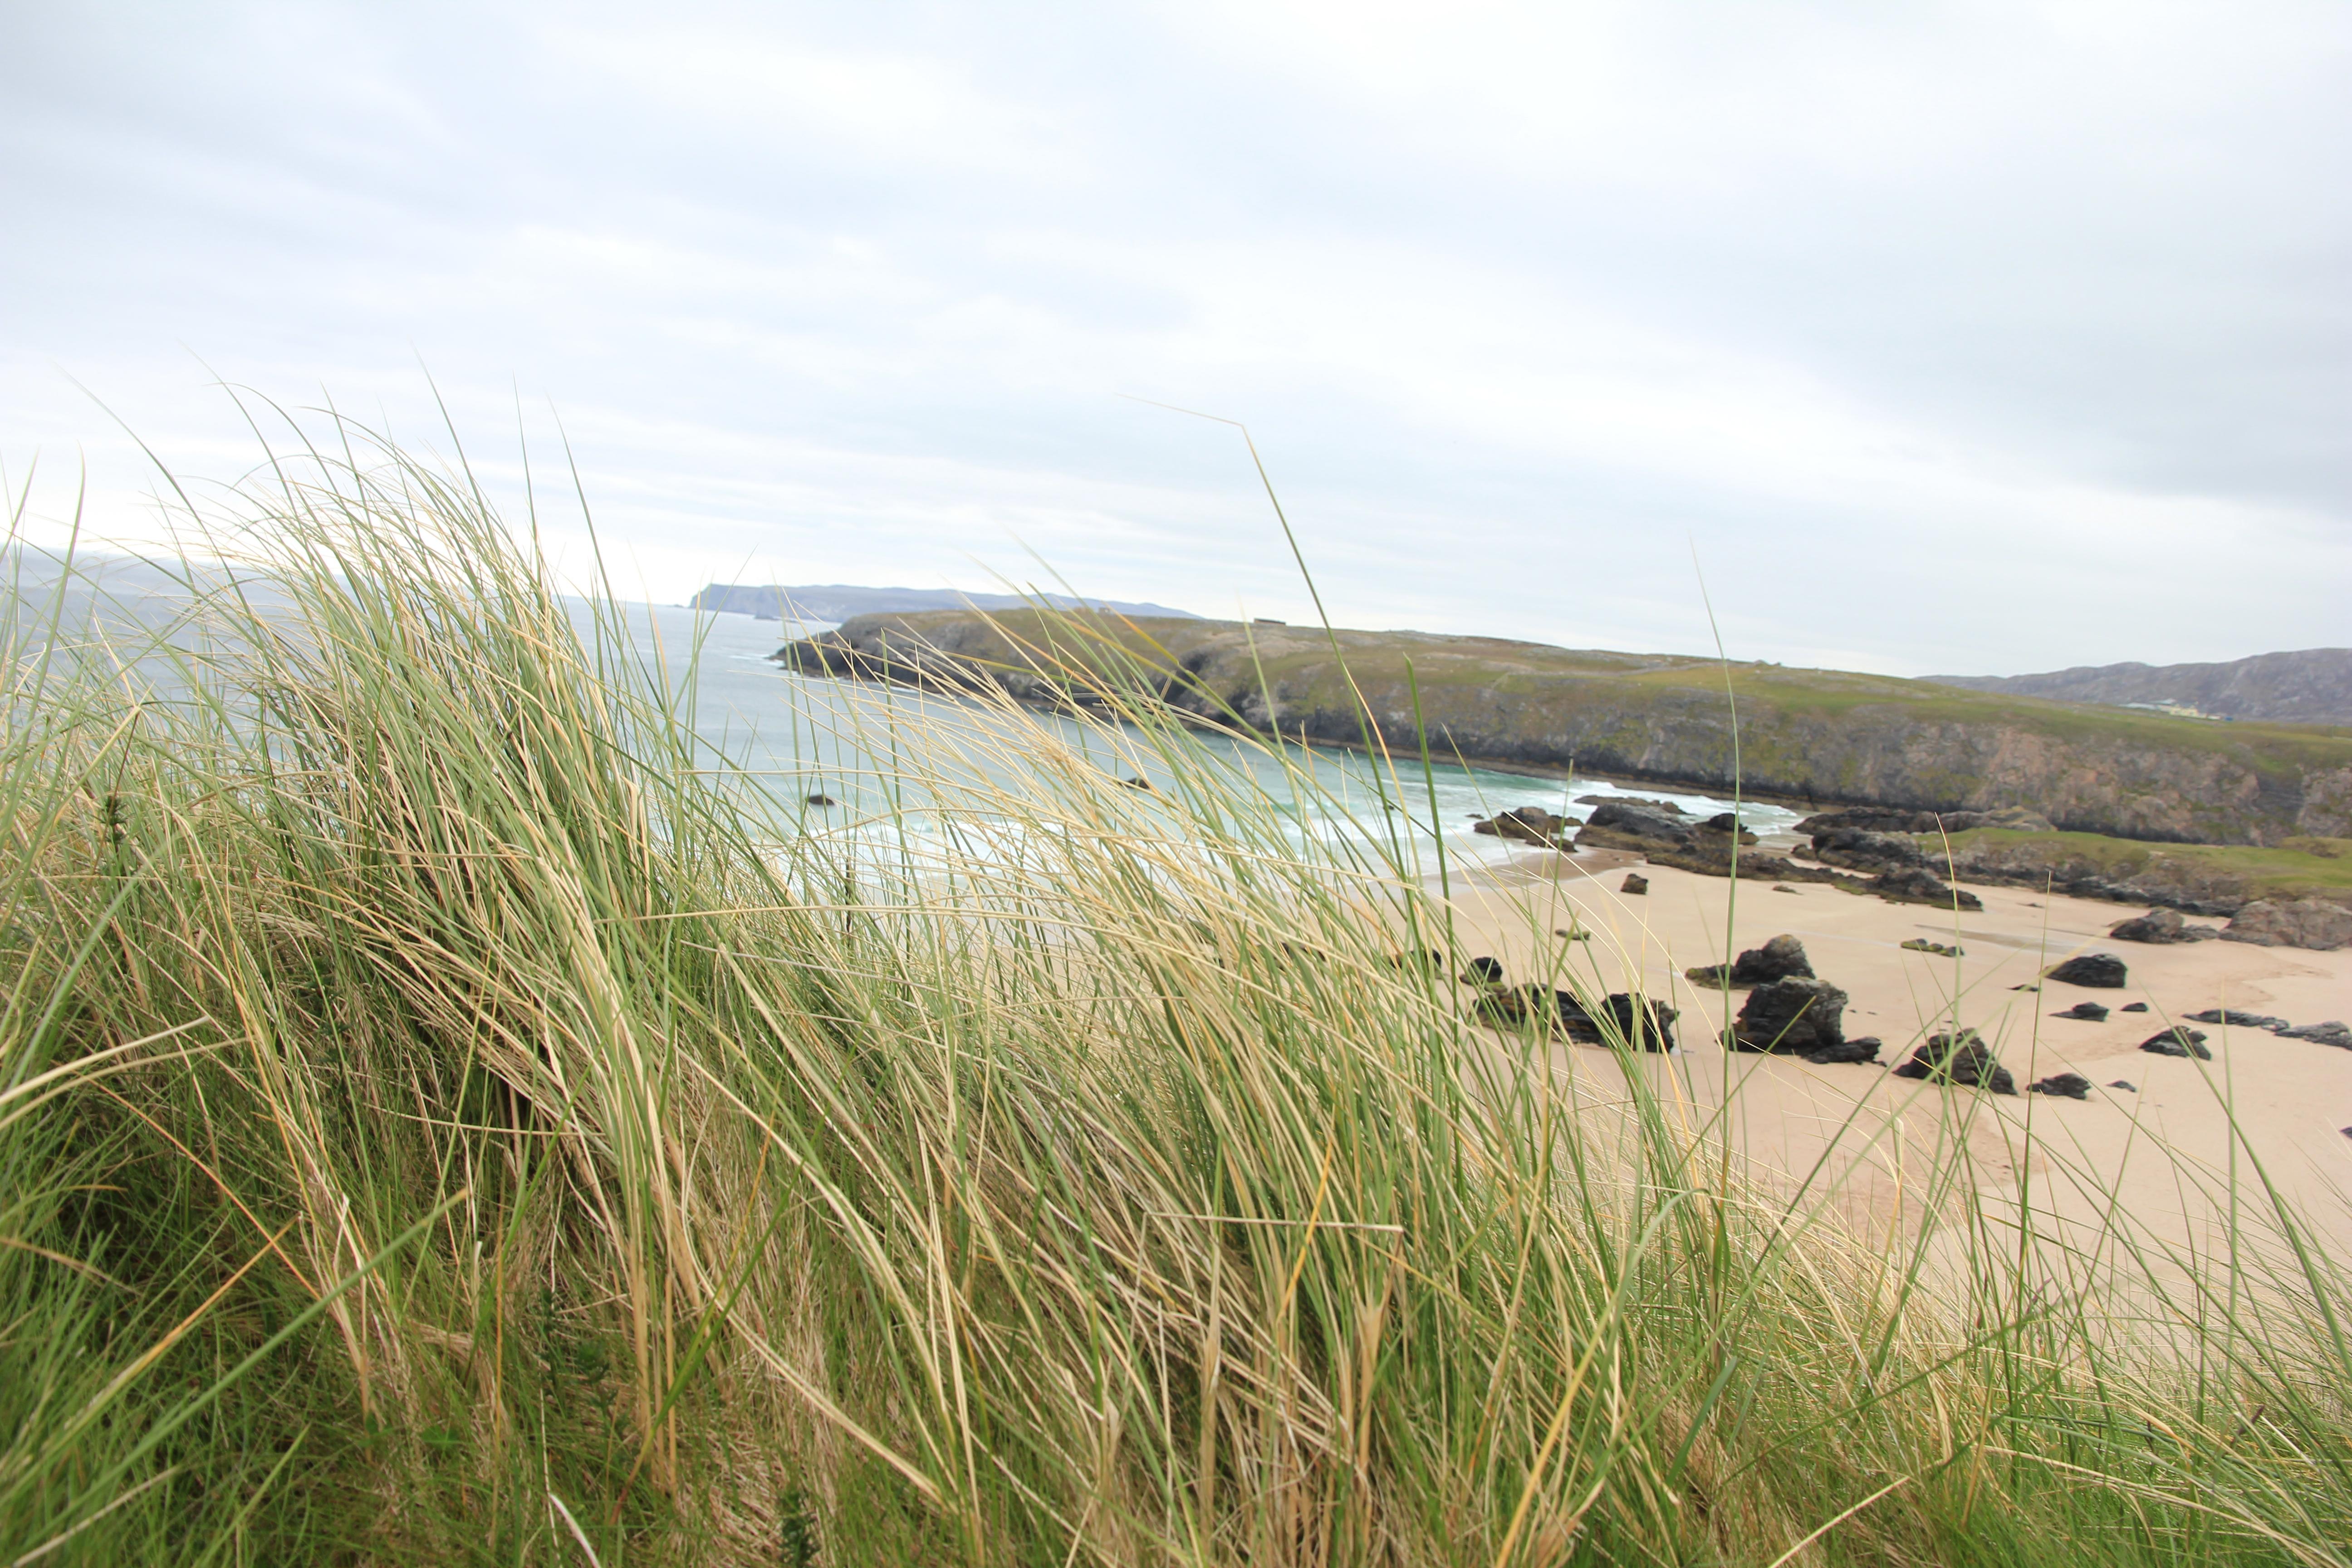 VW T5 T6 California Schottland Roadtrip 2015 Wildcamping Durness Westküste Meer Strand